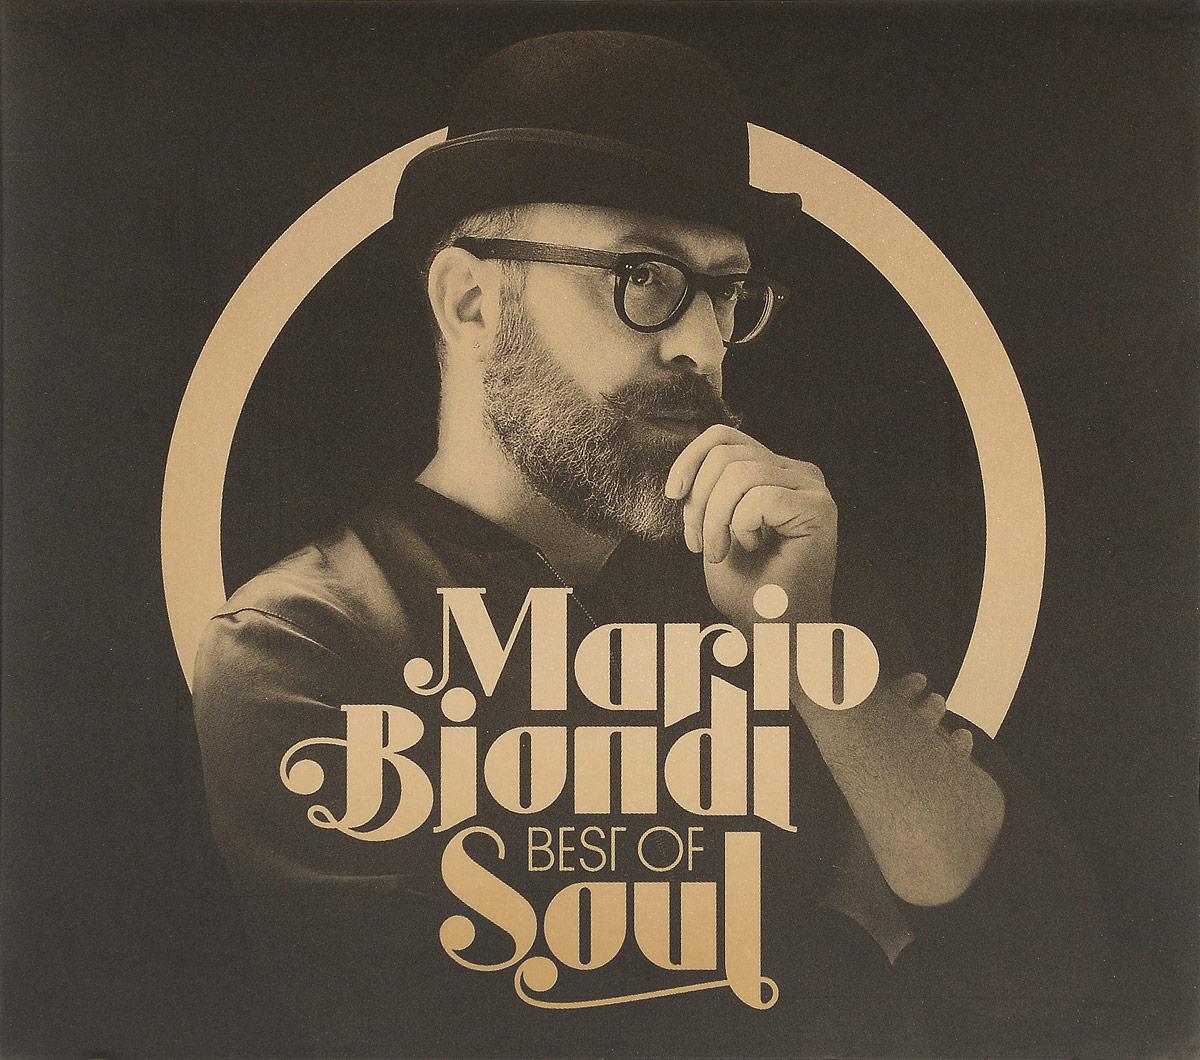 Марио Бионди Mario Biondi. Best Of Soul (2 CD) цена 2017